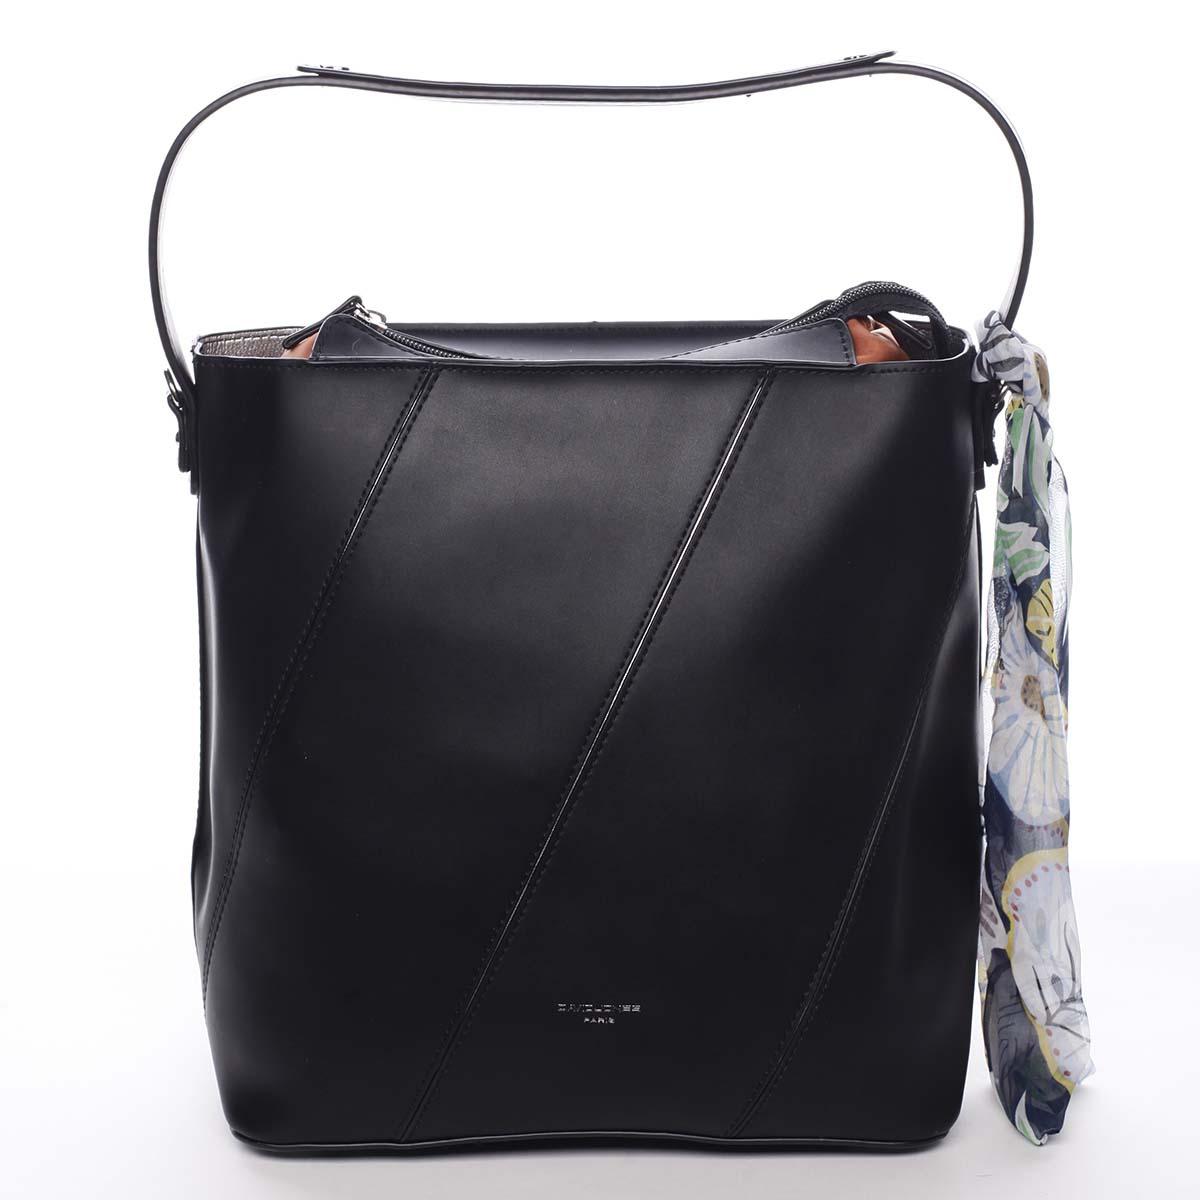 Elegantná dámska kabelka cez rameno čierna - David Jones Abena čierna